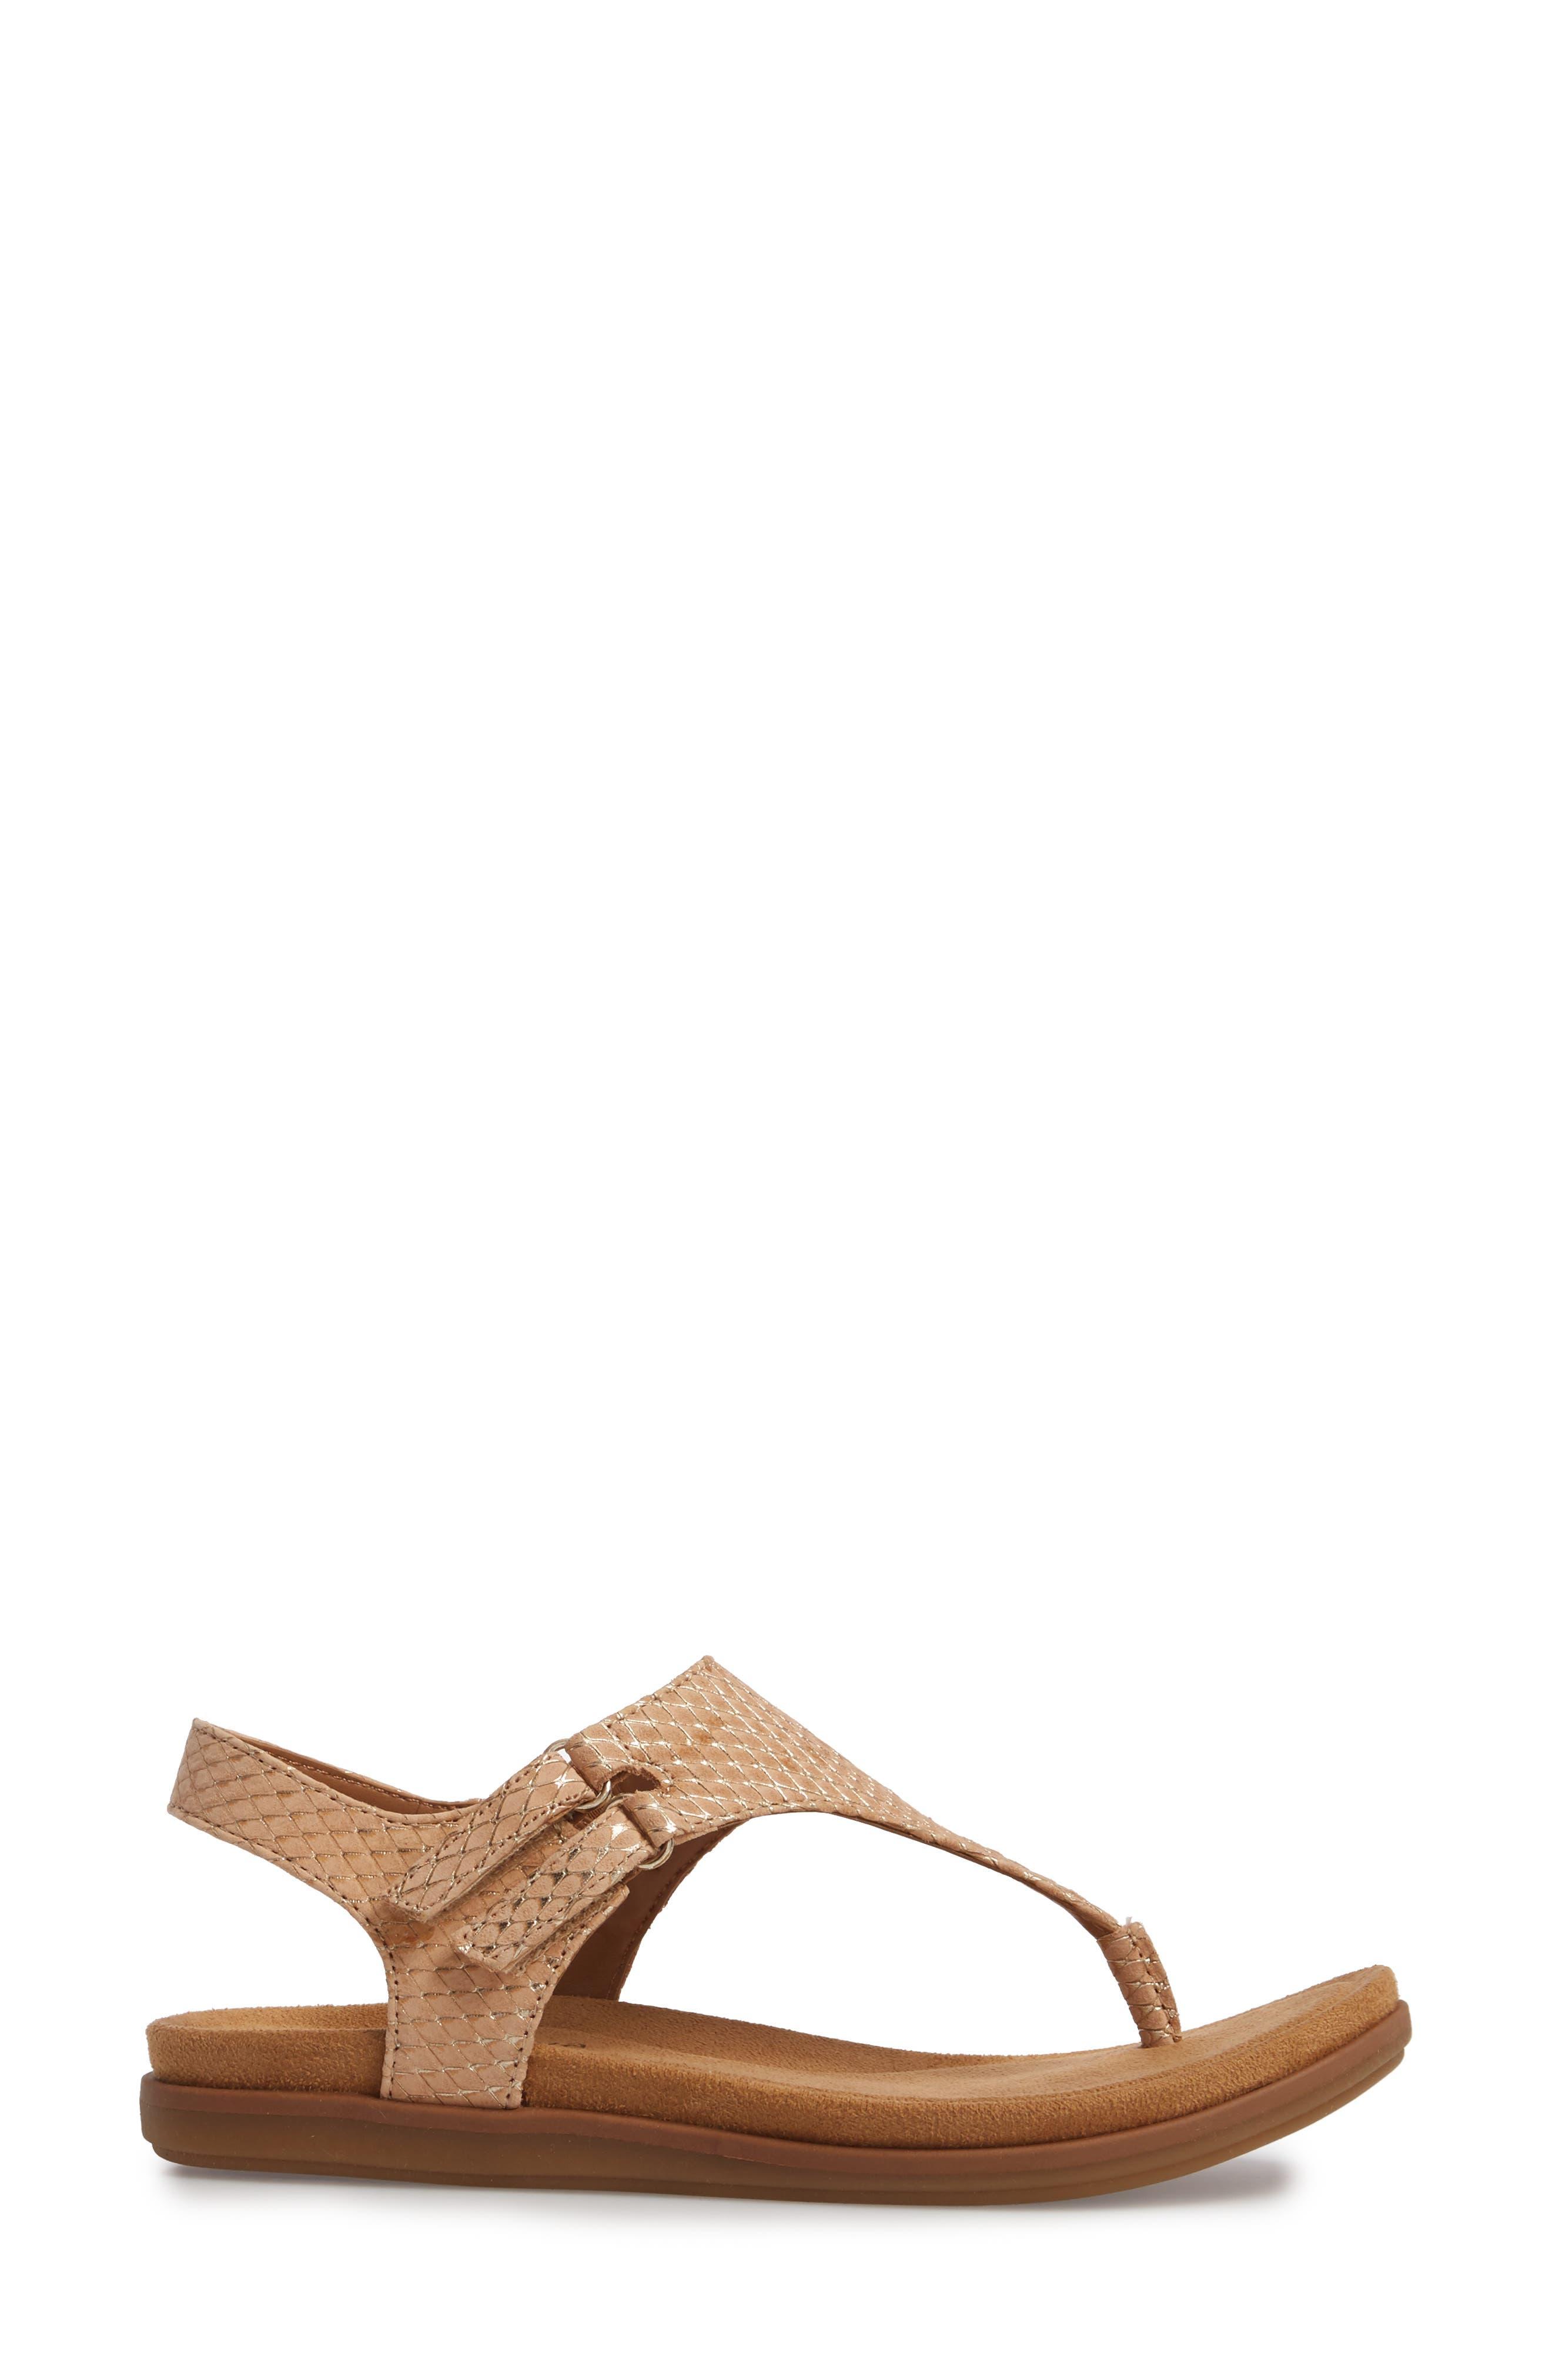 Calina Sandal,                             Alternate thumbnail 3, color,                             Sand Nubuck Leather